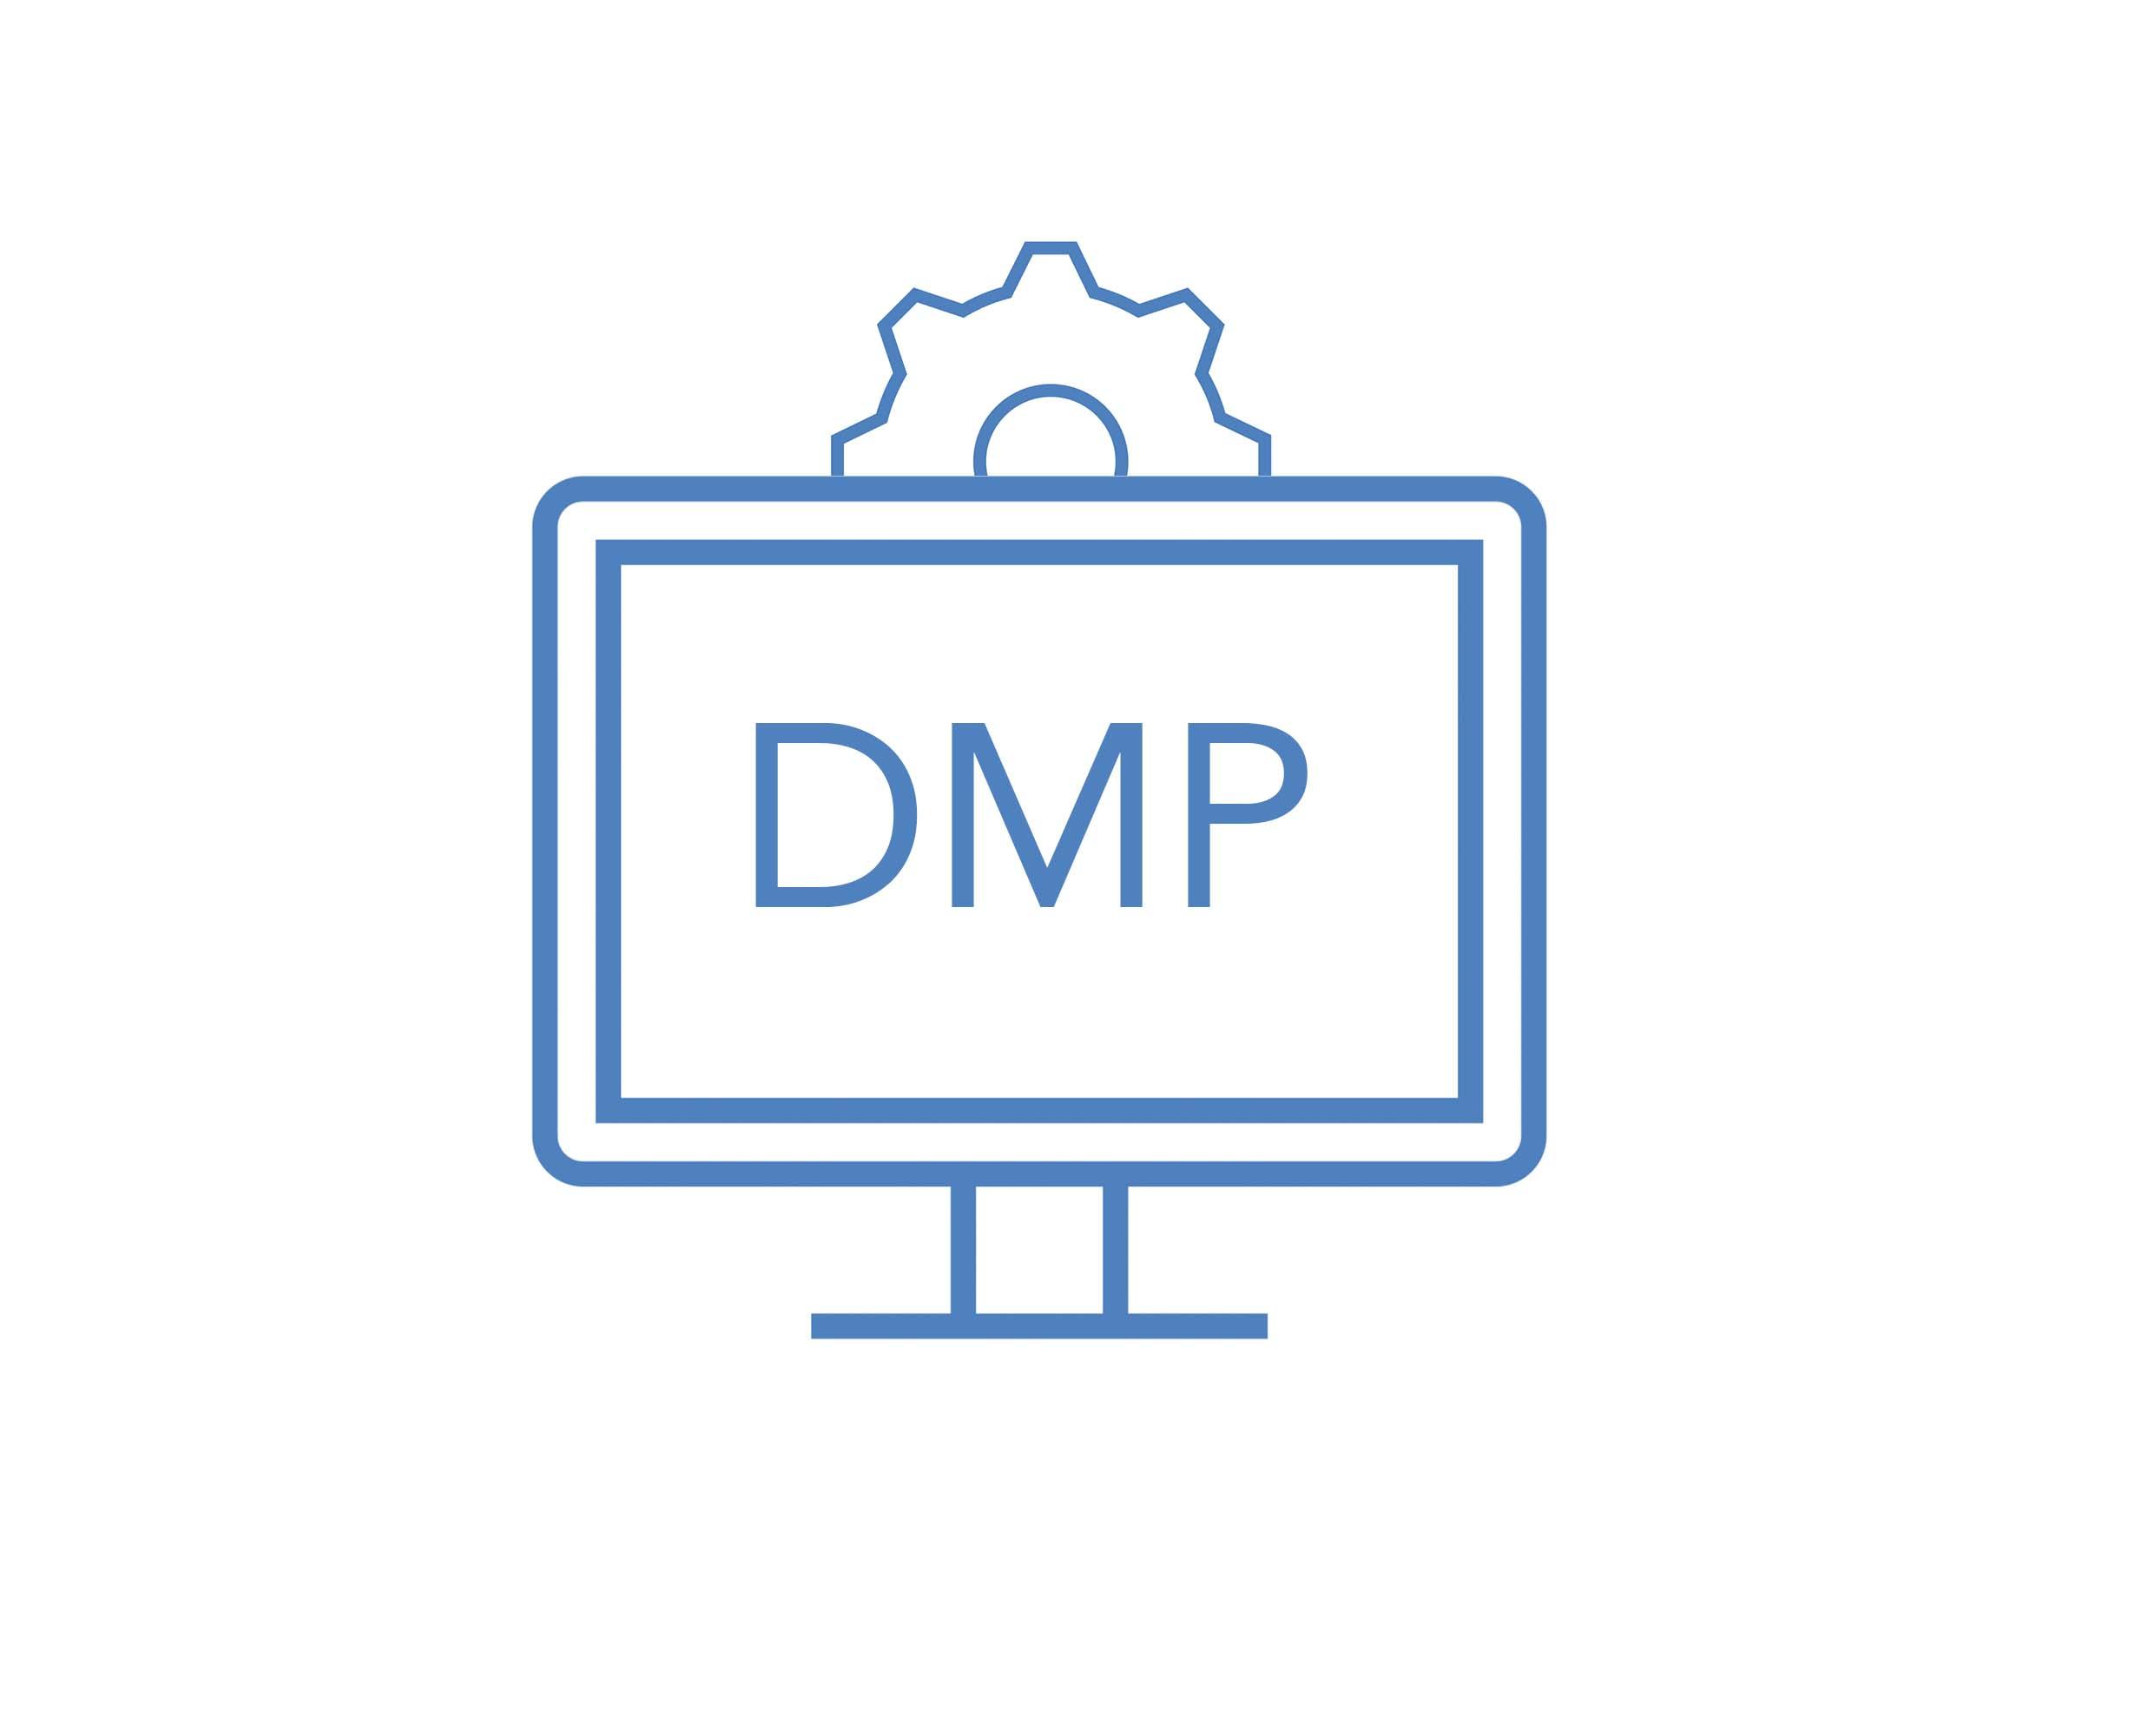 Introduction to Data Management Plans (DMPs)